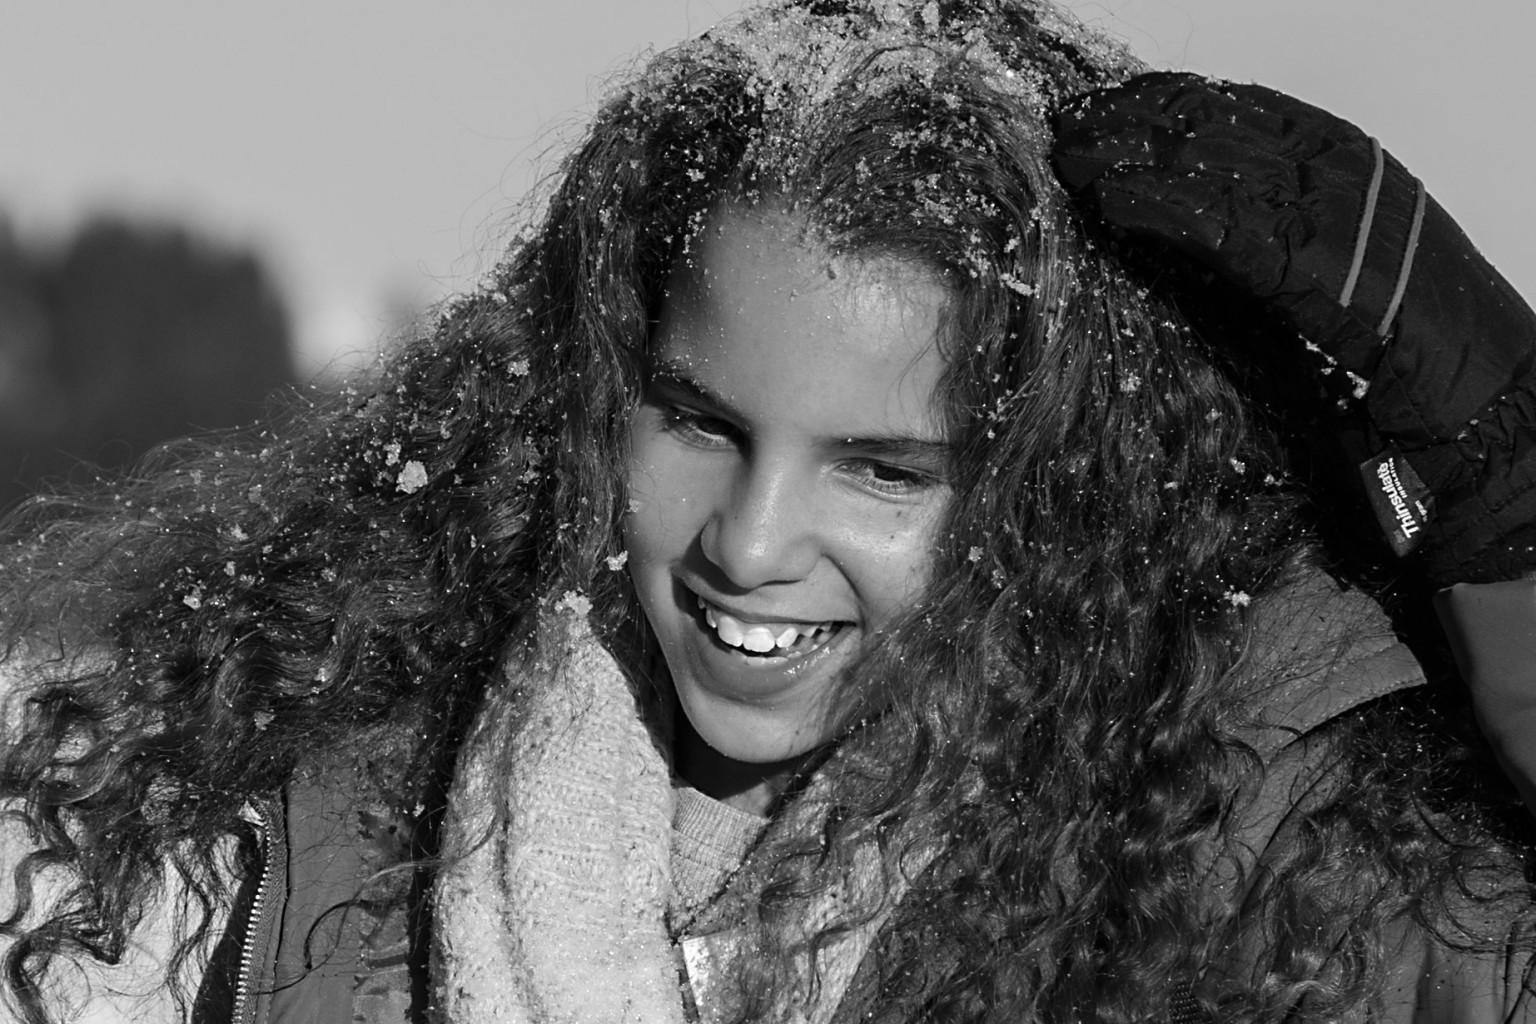 Agam, Israeli Model